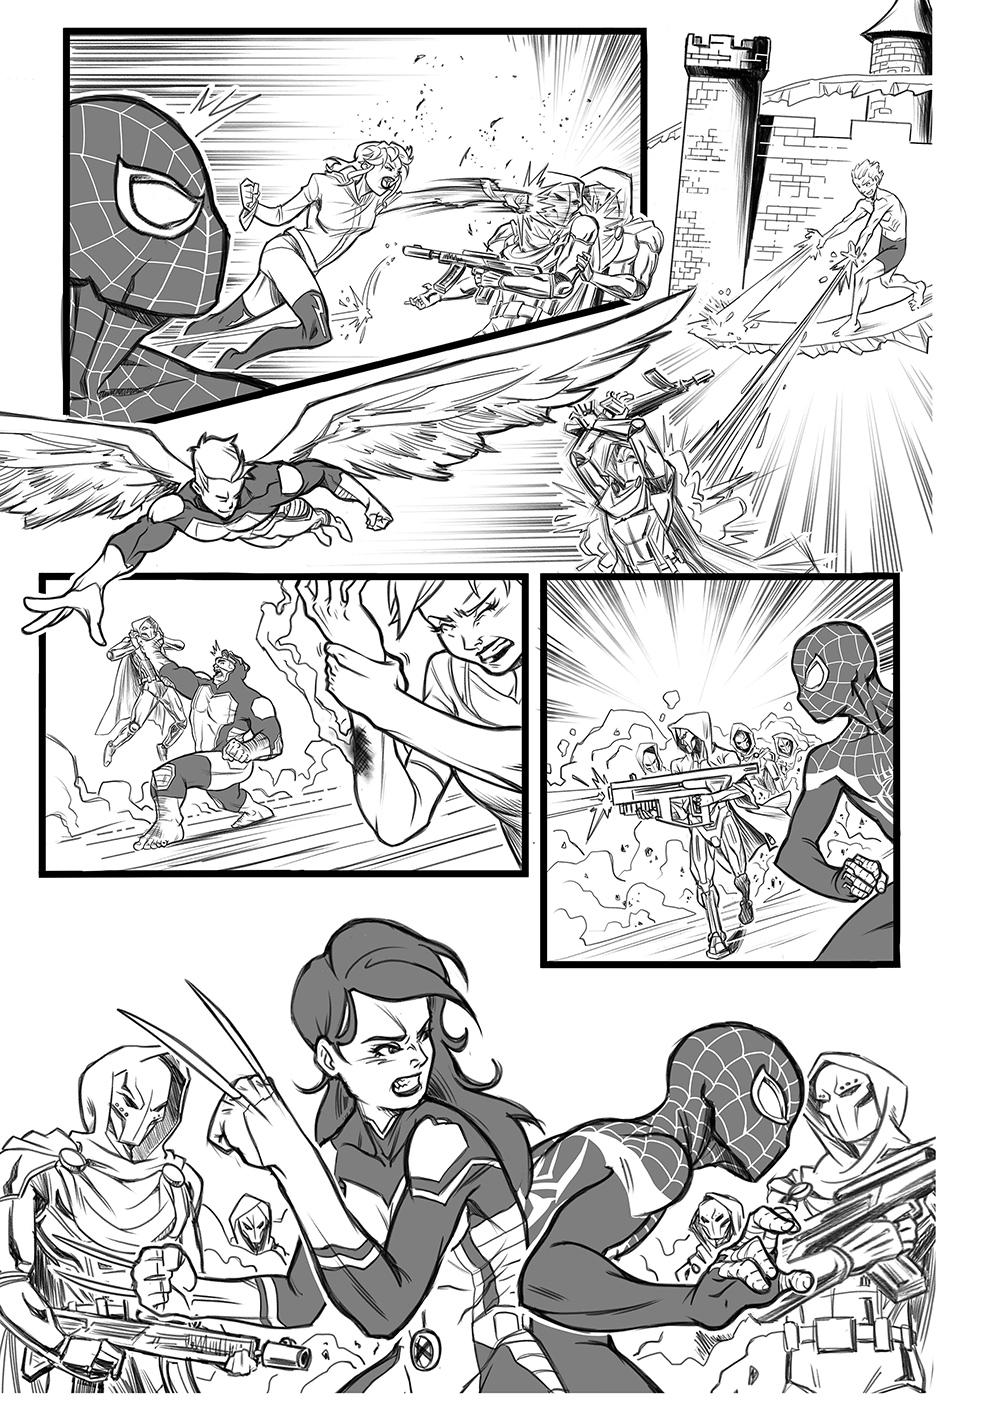 corso_comics_angelo_cannata02